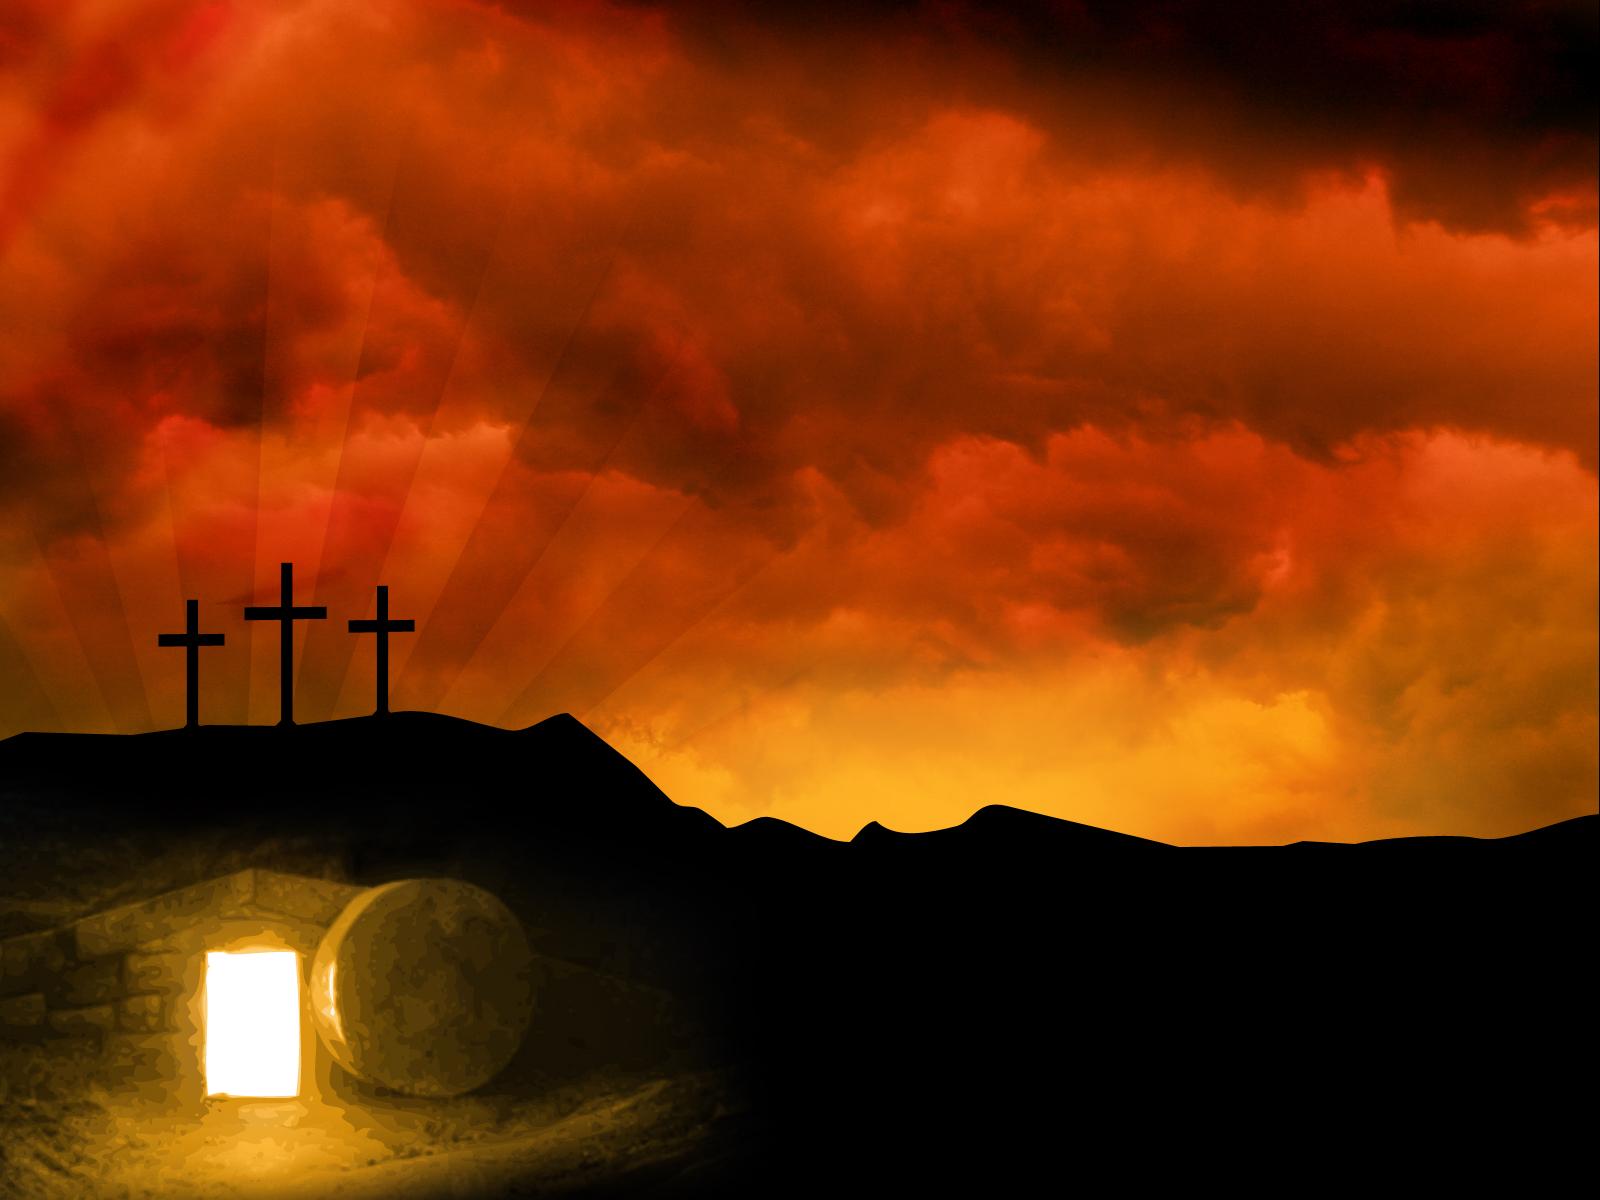 easter resurrection background   Large Images 1600x1200